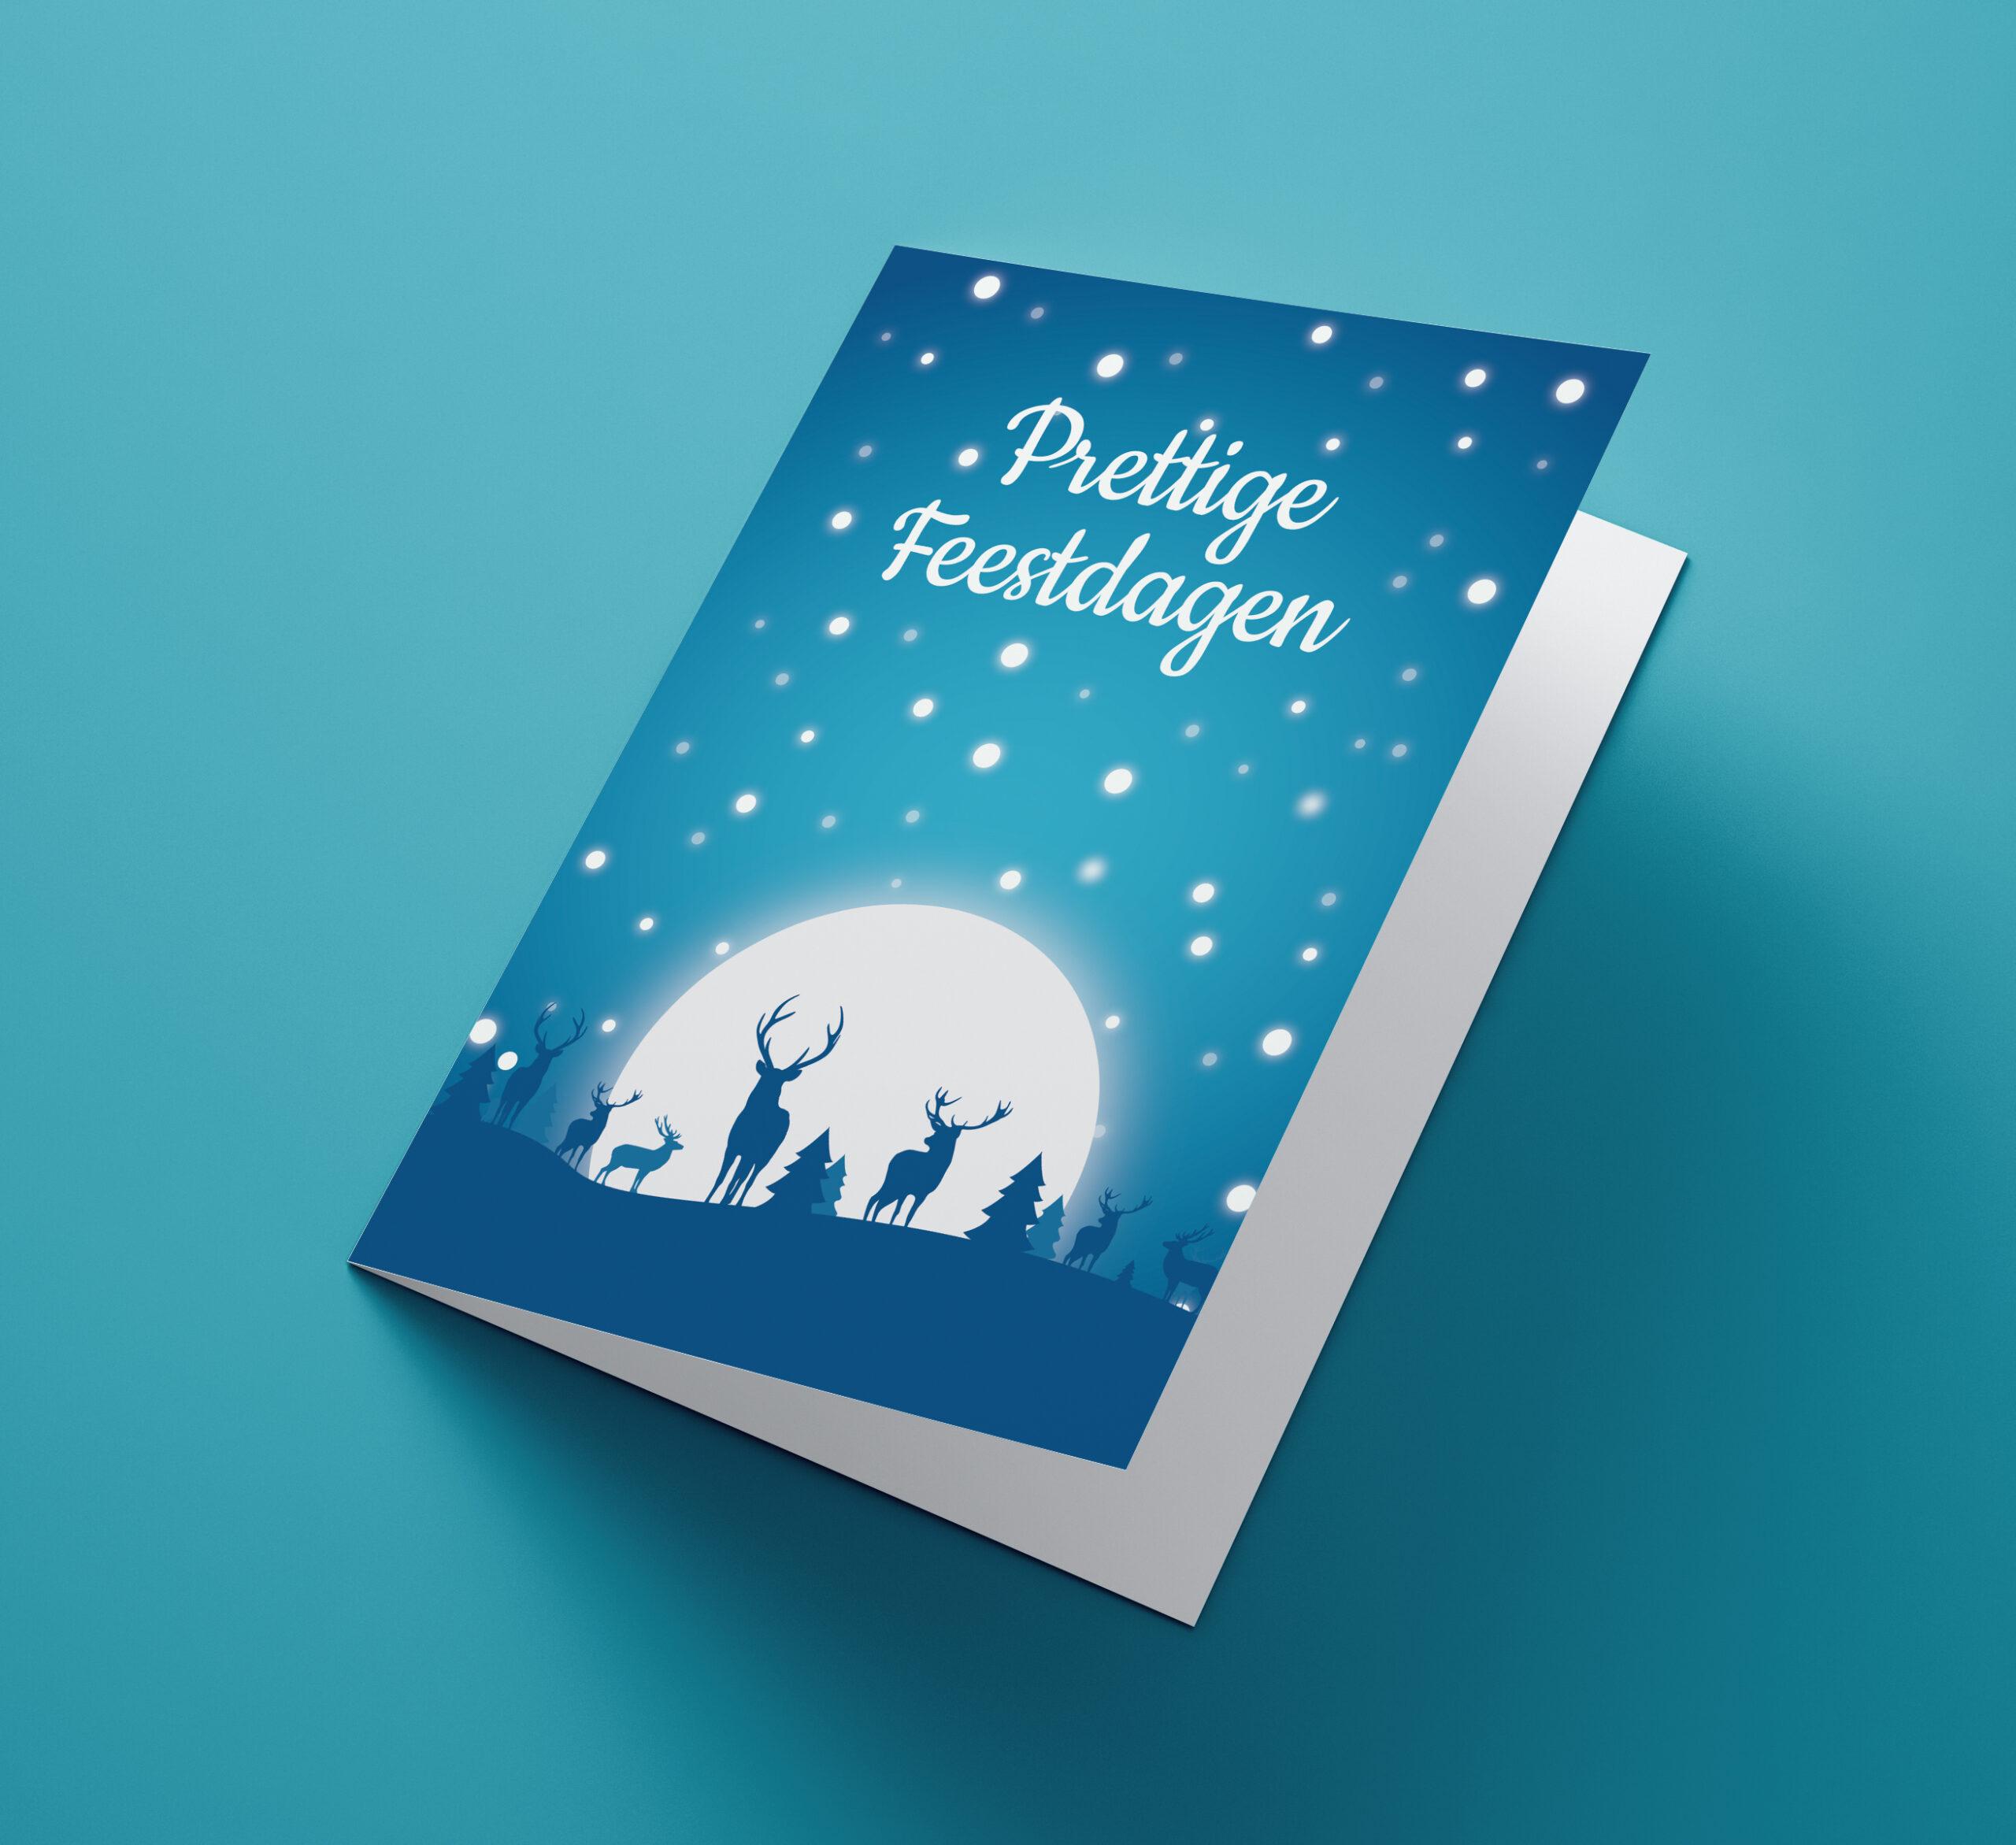 Iceblue Reindeer Moon